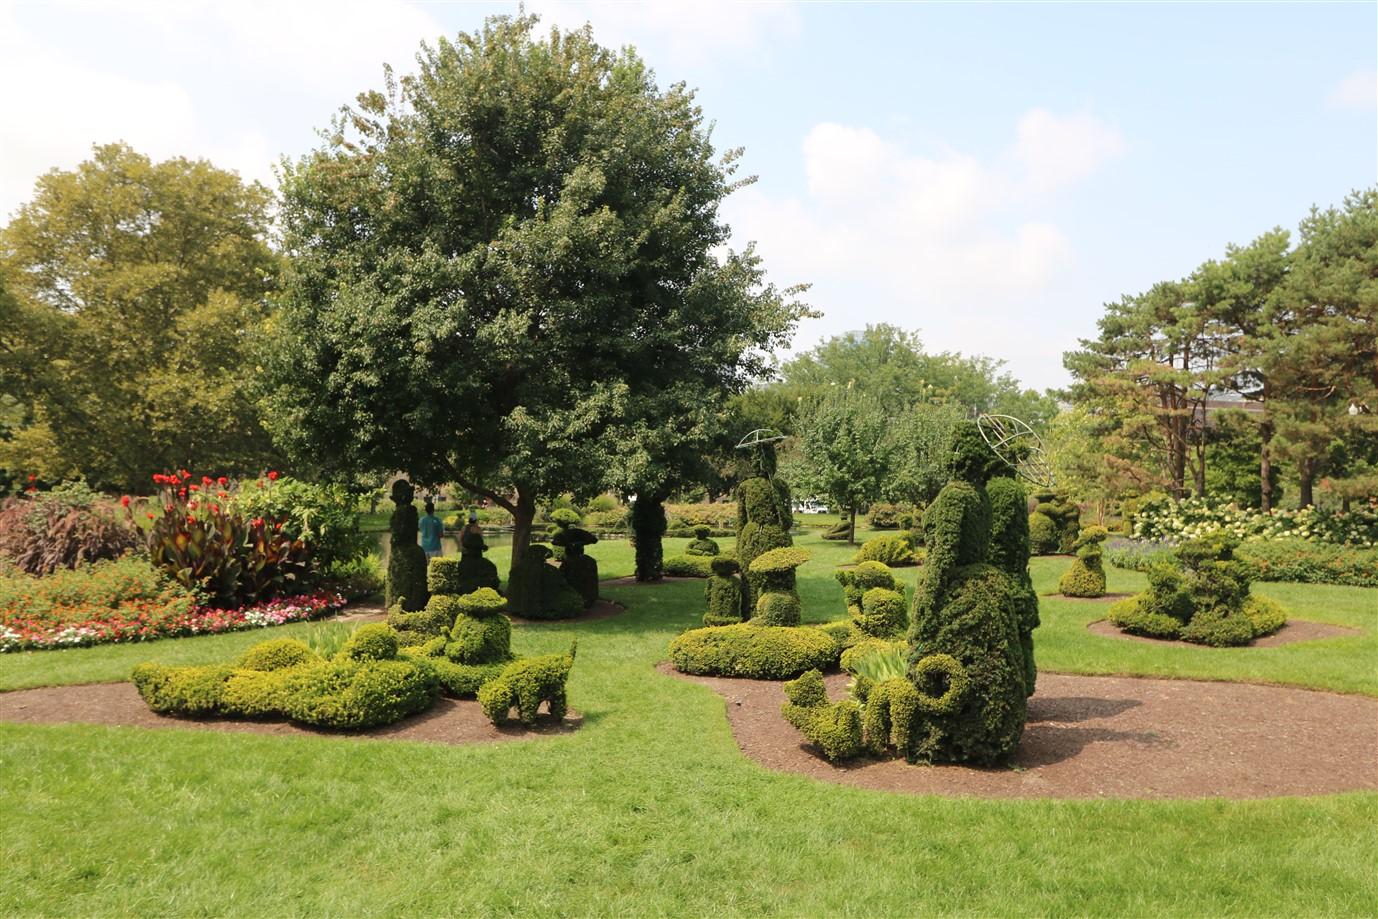 2018 08 26 81 Columbus Topiary Park.jpg